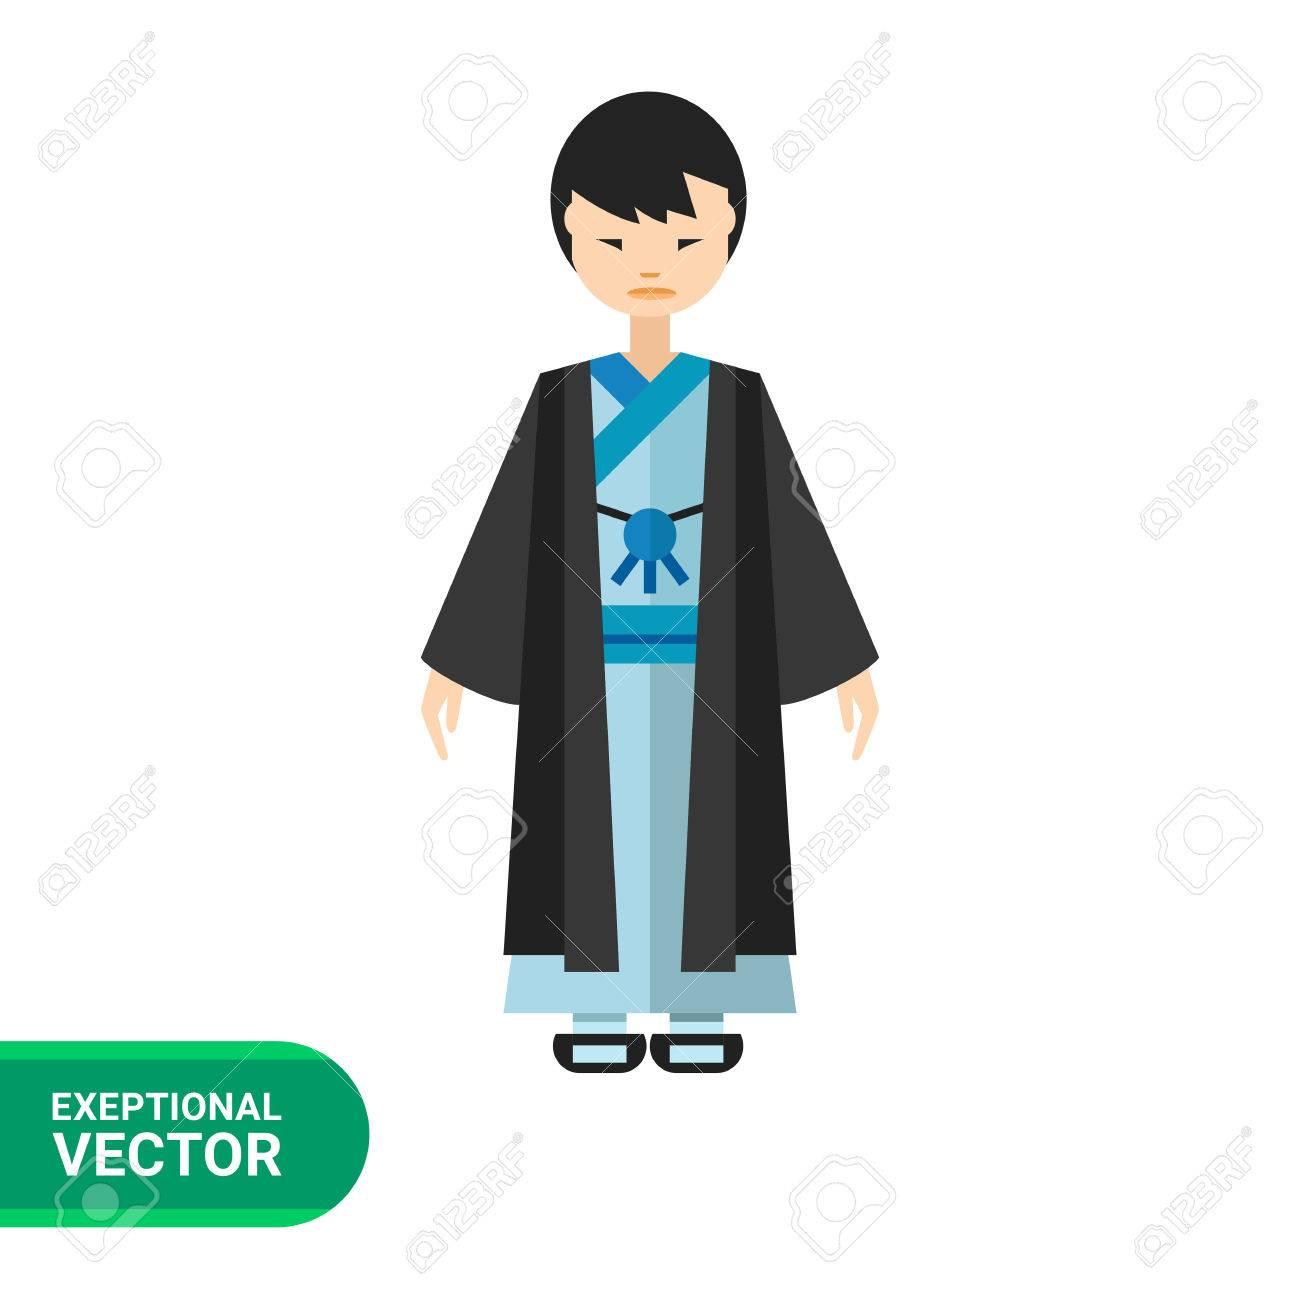 Image of Japanese man wearing blue kimono and black haori.